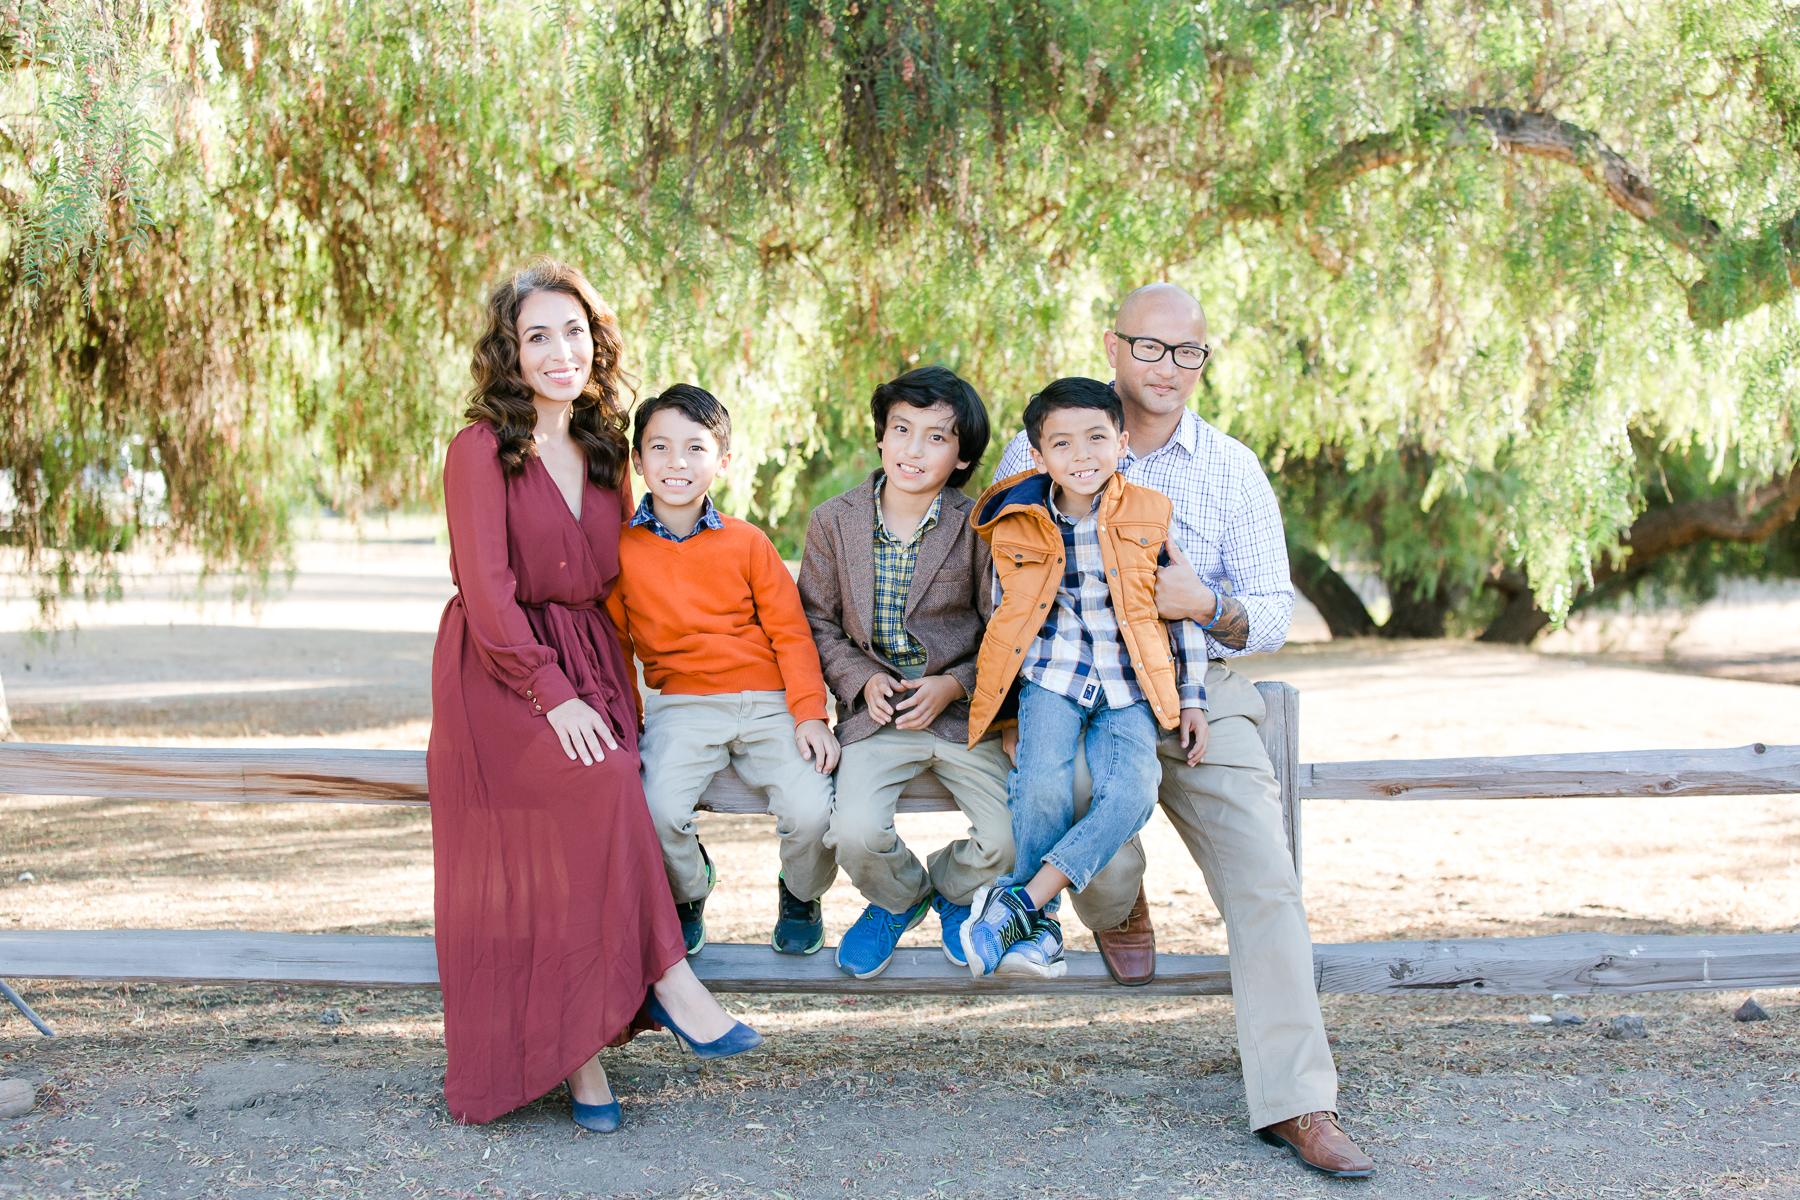 NEMA Photo I.Knightly034 2 - The Almodovar Family | Los Penasquitos canyon preserve | San Diego Photographer